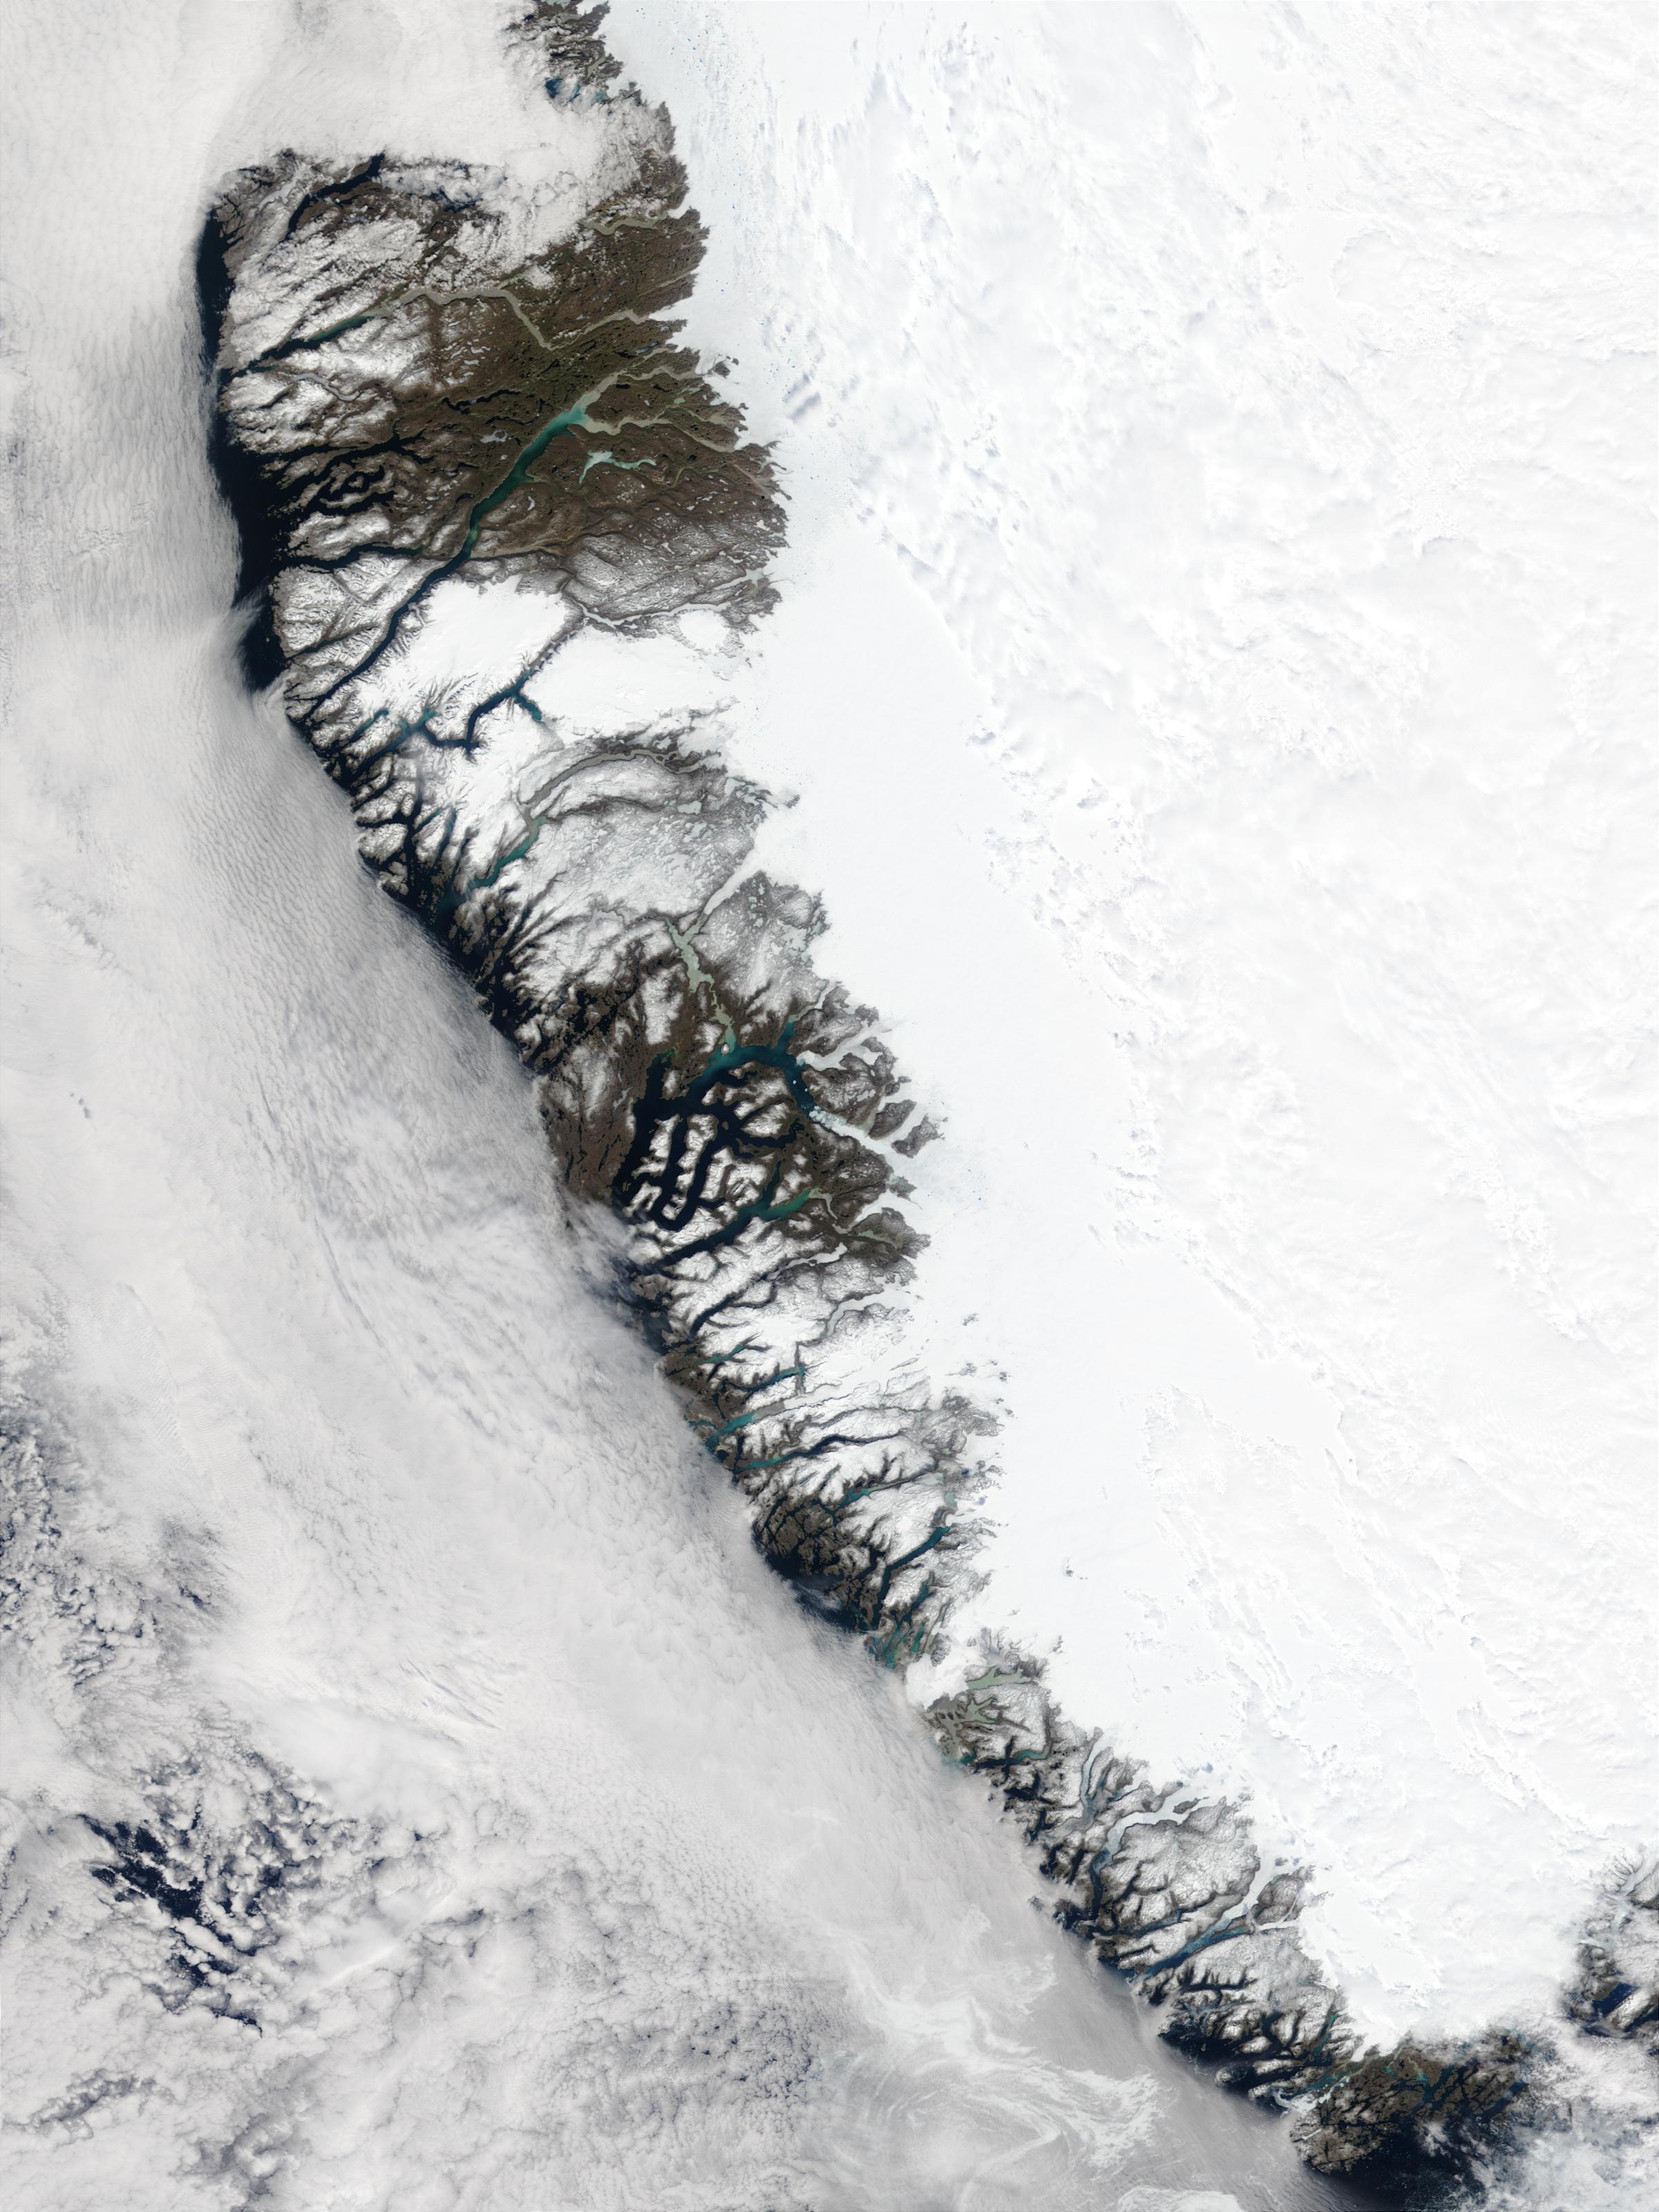 Southwest Greenland